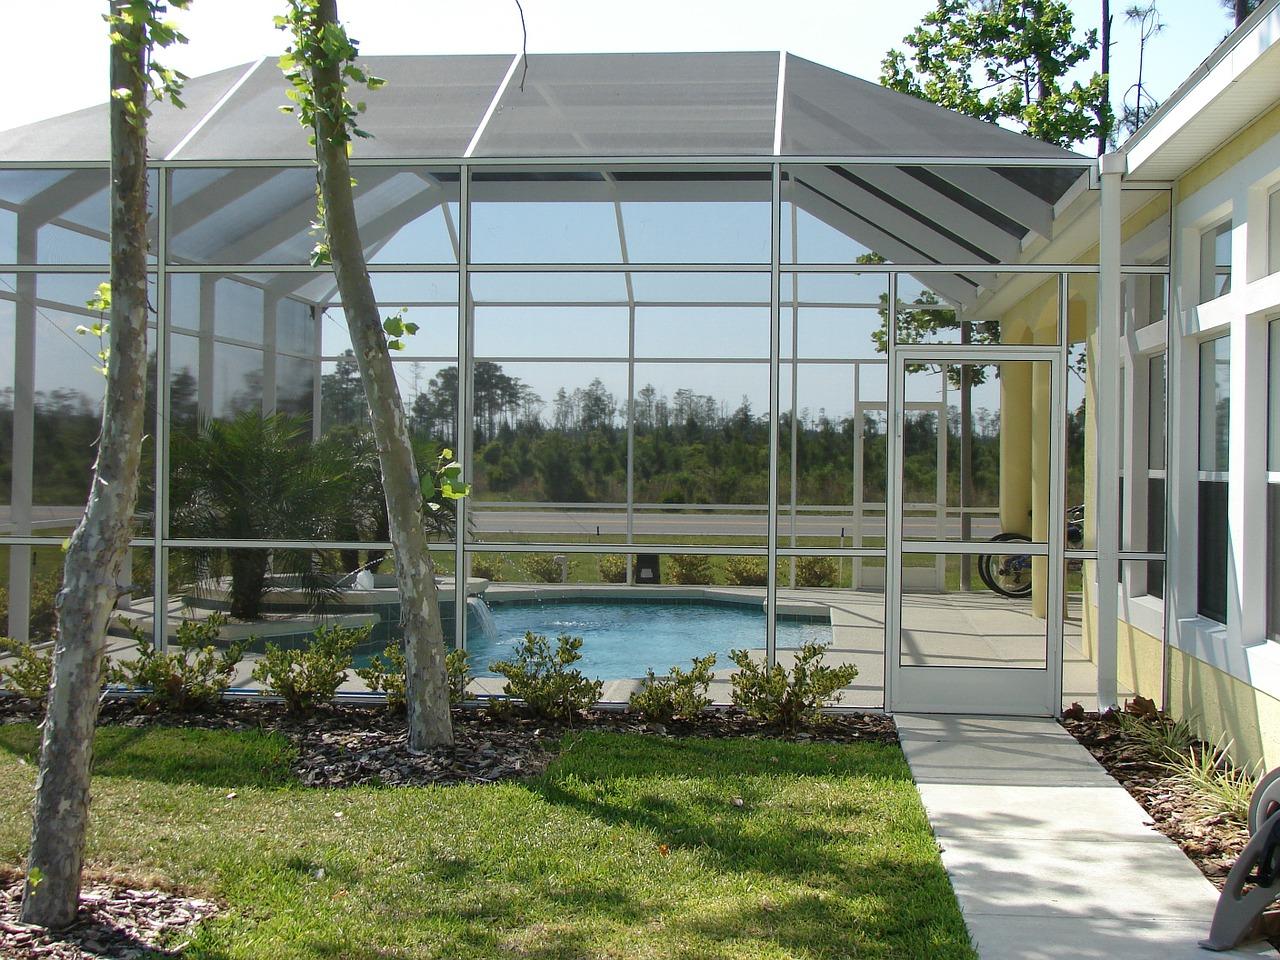 Small Sunroom Ideas- Cheap Ways to Decorate Sunroom ... on Patio Enclosure Ideas  id=81452